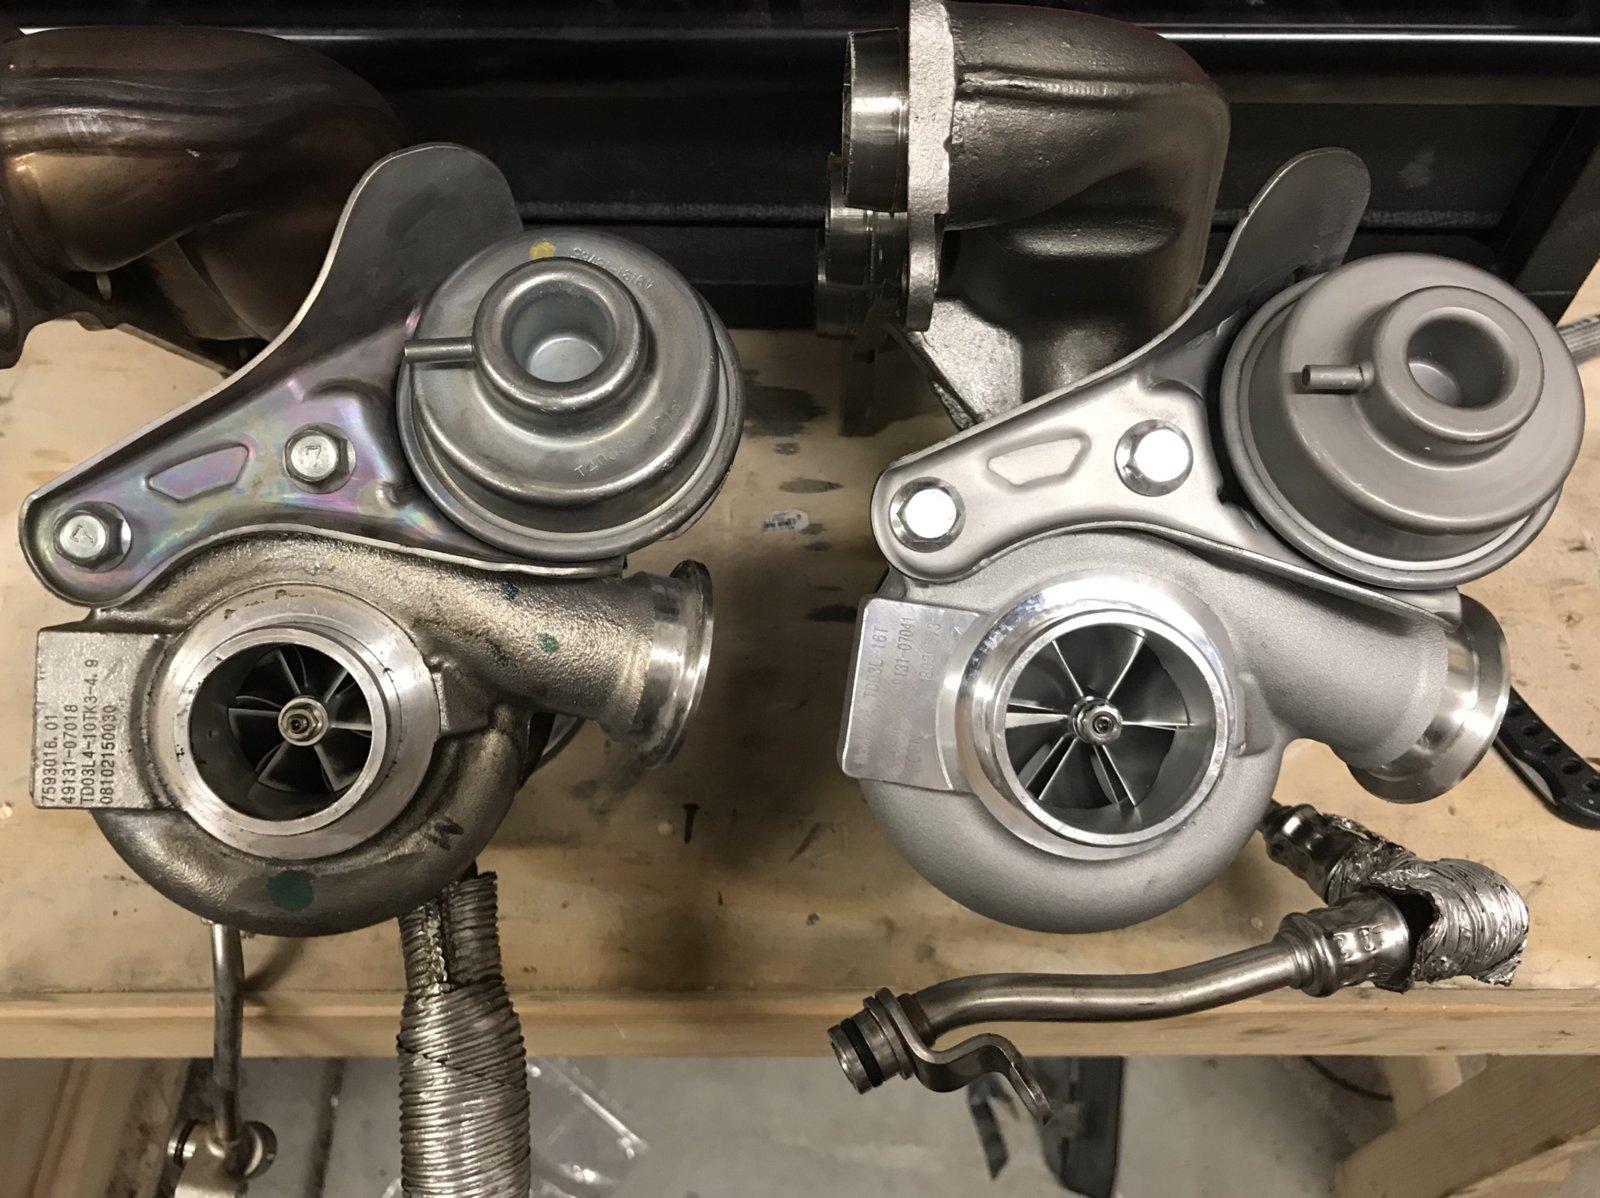 My official China TD04 16T eBay turbos | BMW - SpoolStreet